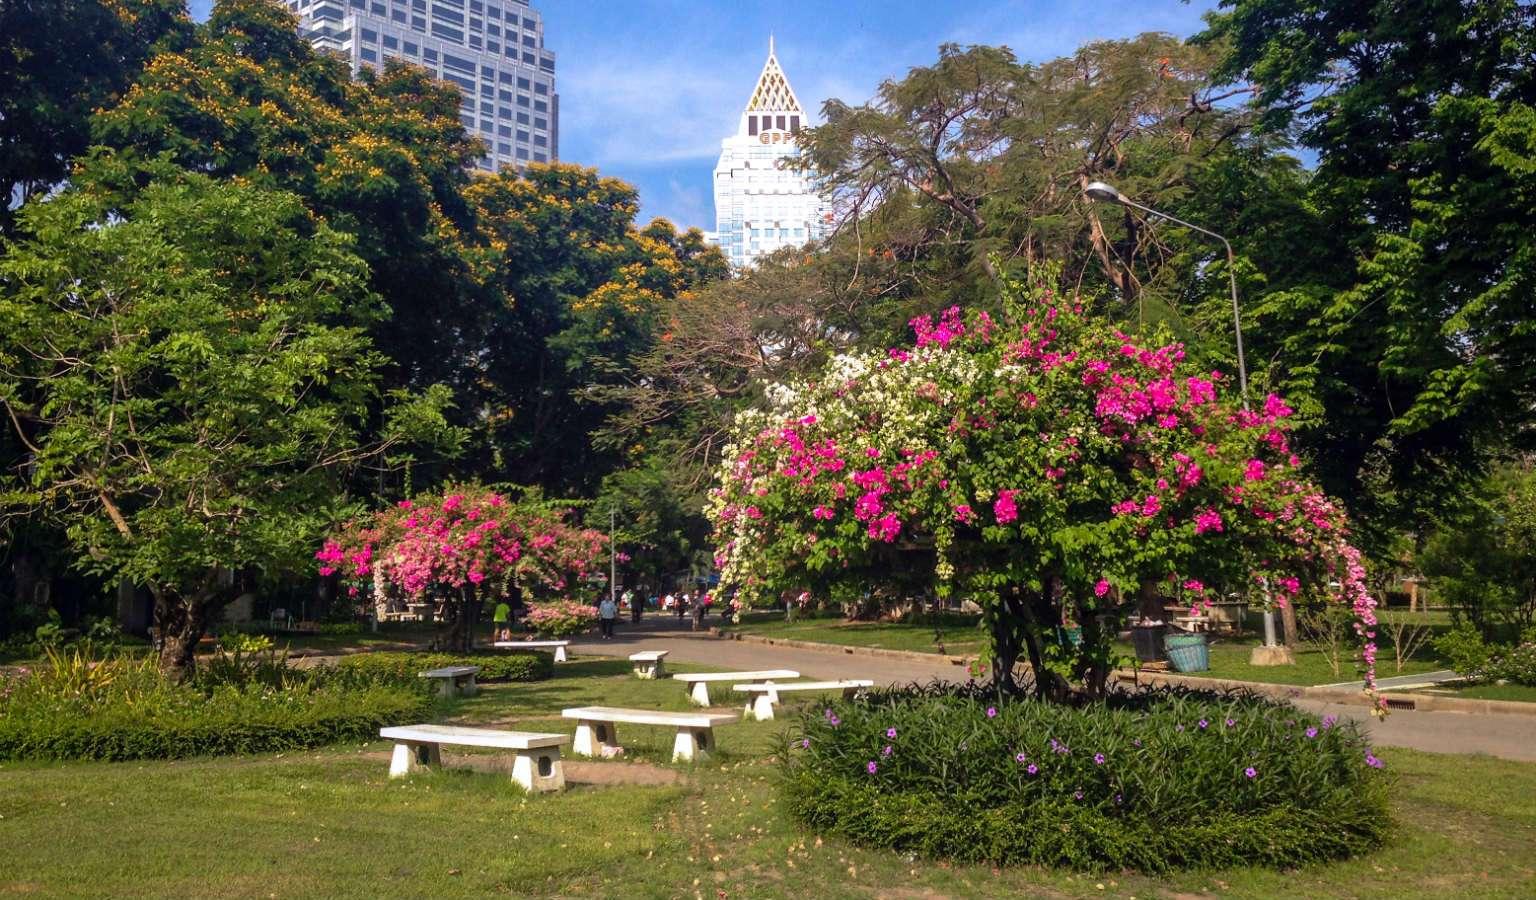 Mooie natuur in het Lumphini Park in Bangkok, Thailand